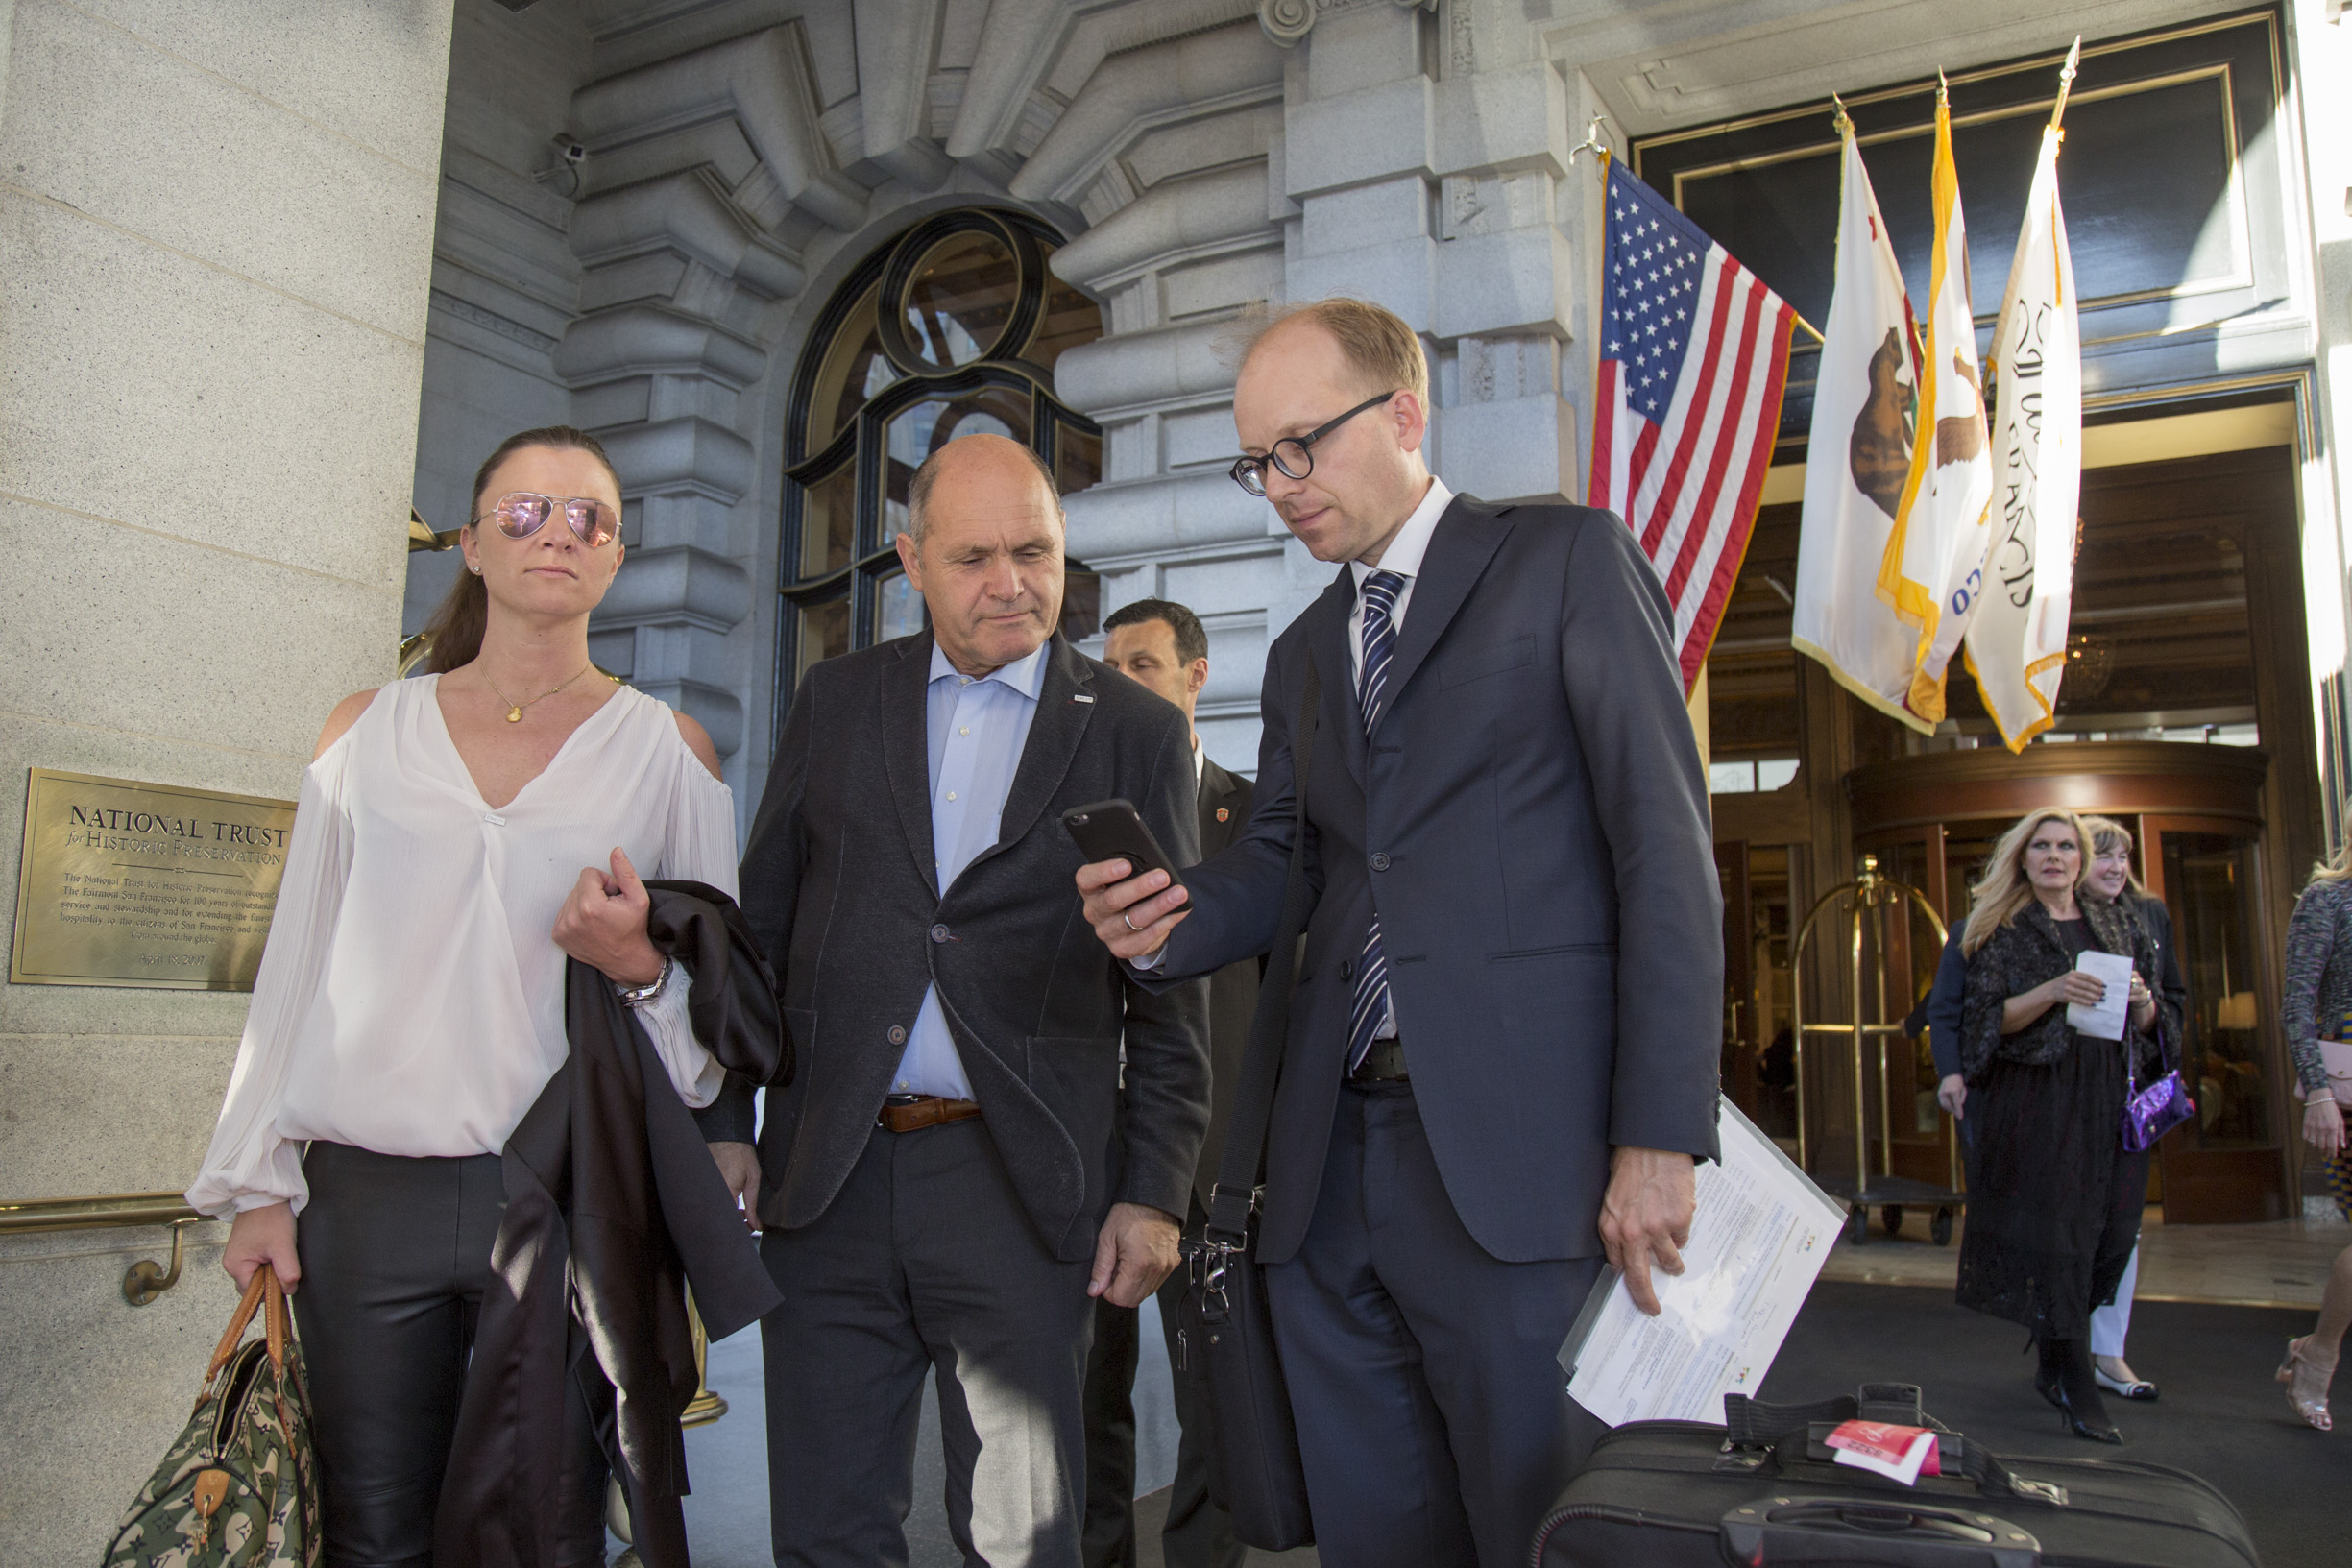 "(from left): Spokesperson Katharina Nehammer, Federal Minister Sobotka and Austrian Consul Martin Rauchbauer.          96              Normal   0           false   false   false     EN-US   X-NONE   X-NONE                                                                                                                                                                                                                                                                                                                                                                                                                                                                                                                                                                                                                                                                                                                                                                                                                                                                                     /* Style Definitions */ table.MsoNormalTable {mso-style-name:""Table Normal""; mso-tstyle-rowband-size:0; mso-tstyle-colband-size:0; mso-style-noshow:yes; mso-style-priority:99; mso-style-parent:""""; mso-padding-alt:0in 5.4pt 0in 5.4pt; mso-para-margin:0in; mso-para-margin-bottom:.0001pt; mso-pagination:widow-orphan; font-size:12.0pt; font-family:Calibri; mso-ascii-font-family:Calibri; mso-ascii-theme-font:minor-latin; mso-hansi-font-family:Calibri; mso-hansi-theme-font:minor-latin;}     Photo: BMI/ Jürgen Makowecz"